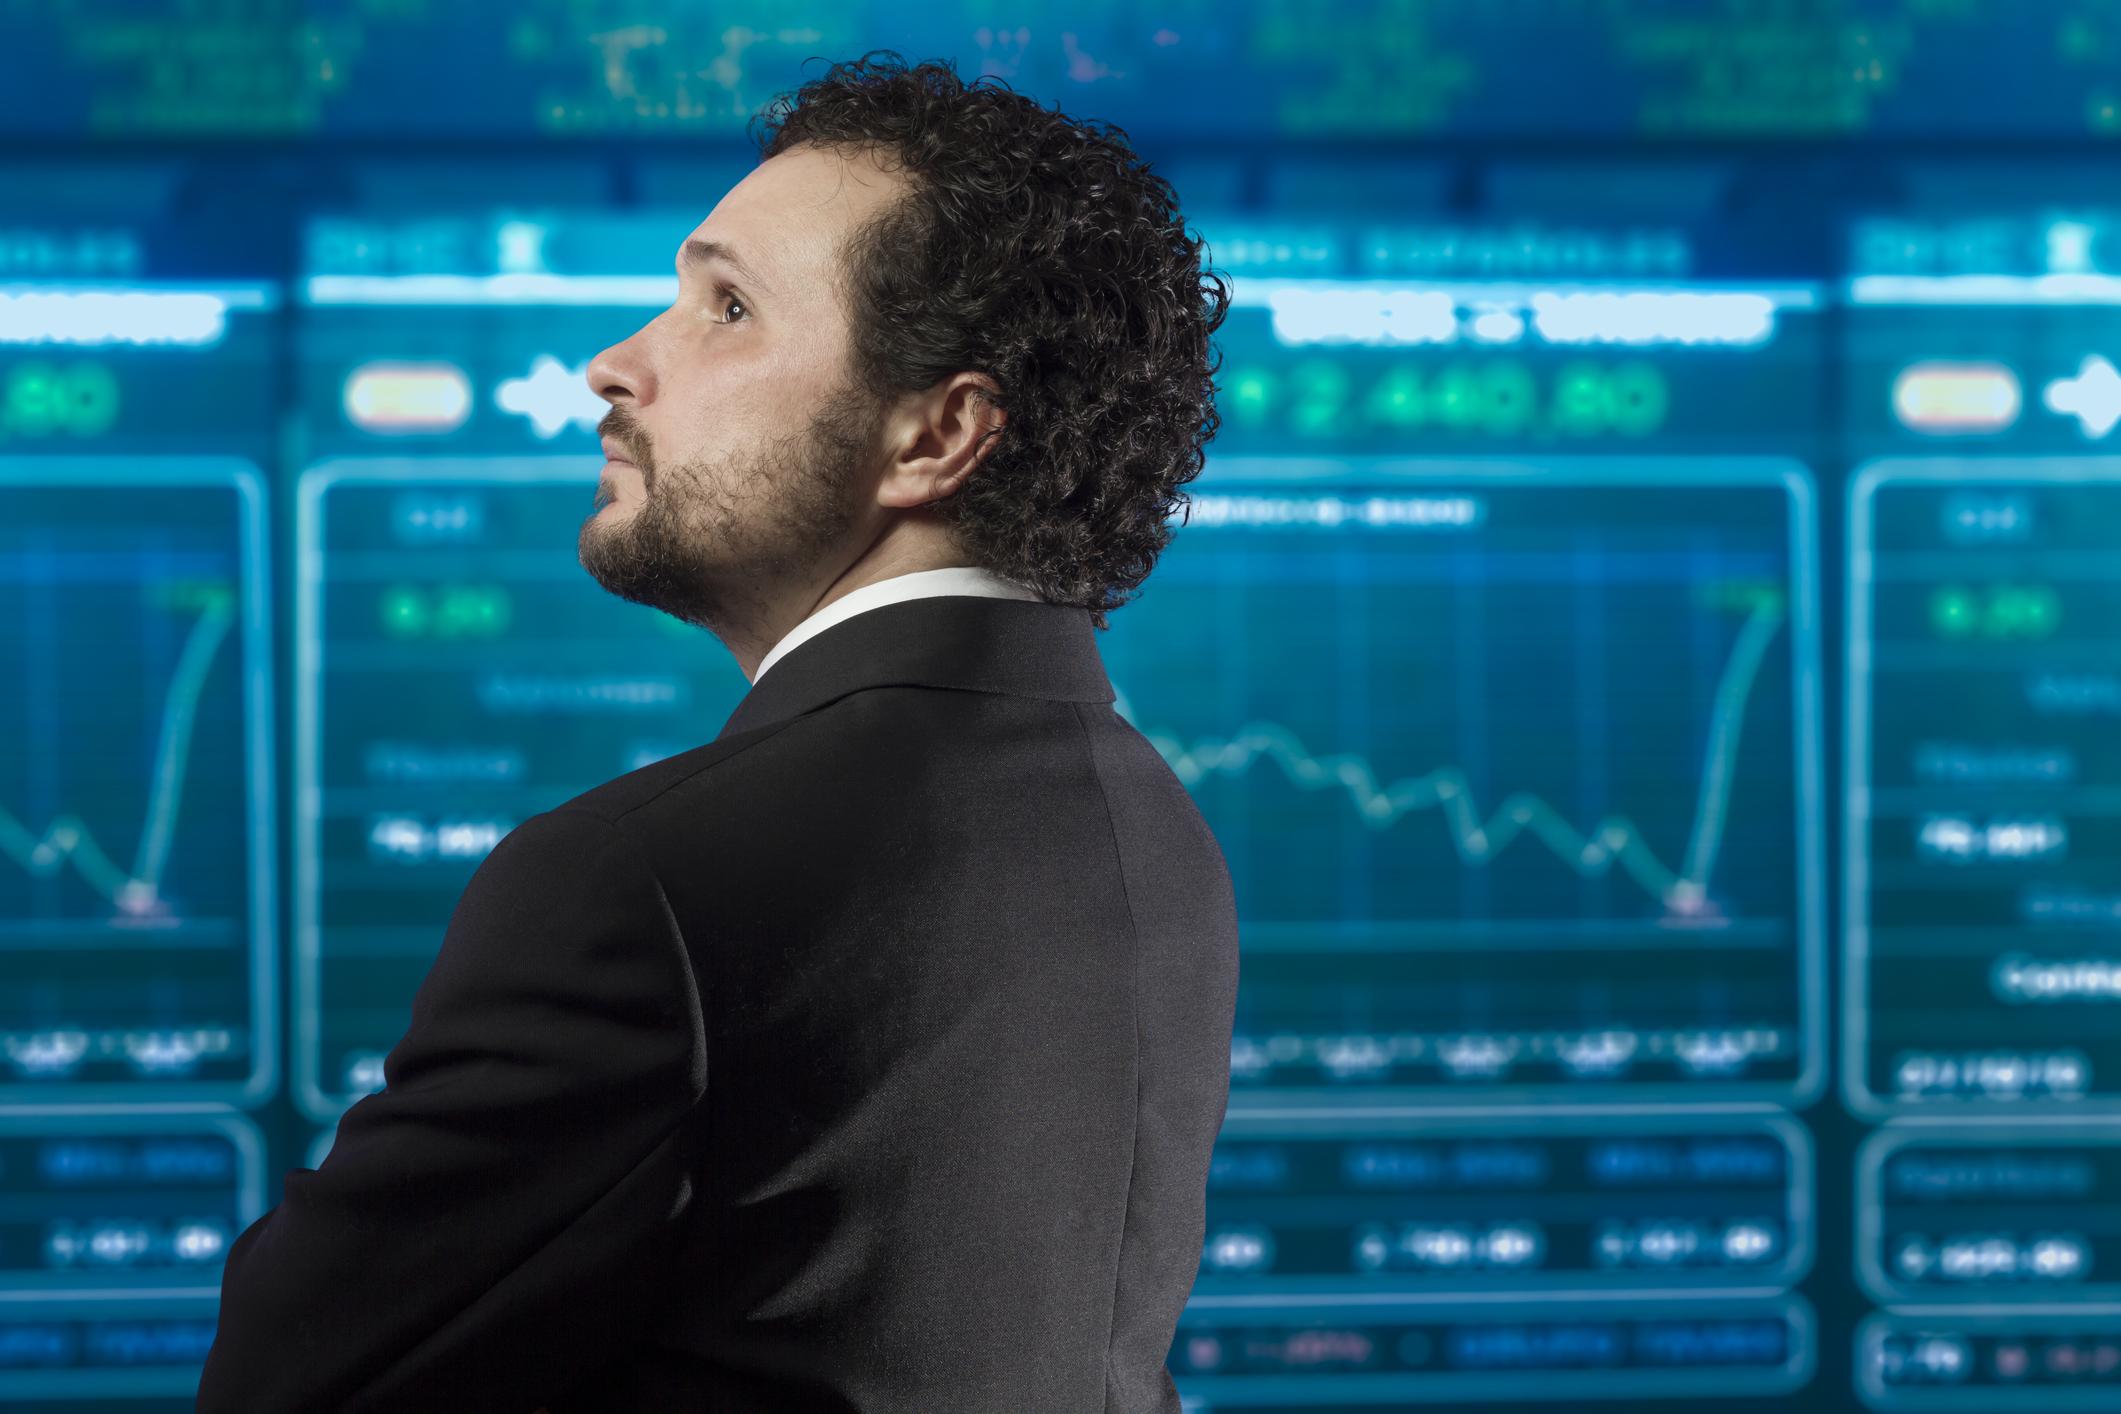 3 Nasdaq 100 Stocks With 61% to 82% Upside, According to Wall Street